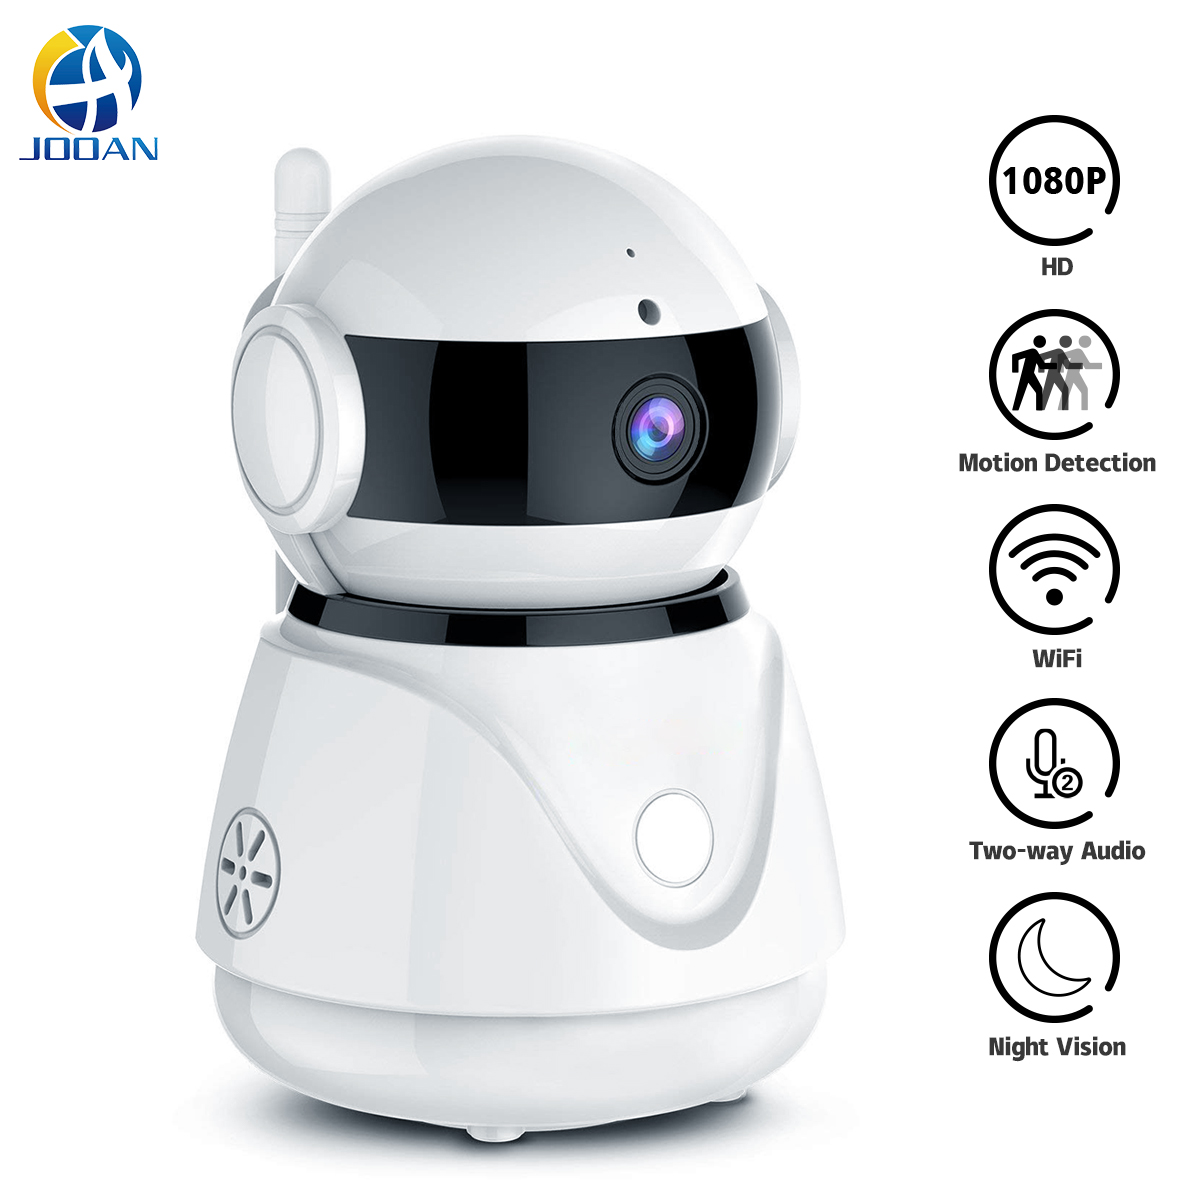 JOOAN 1080P WIFI Wireless Security Camera CCTV Home IP Camera Day/&Night Version